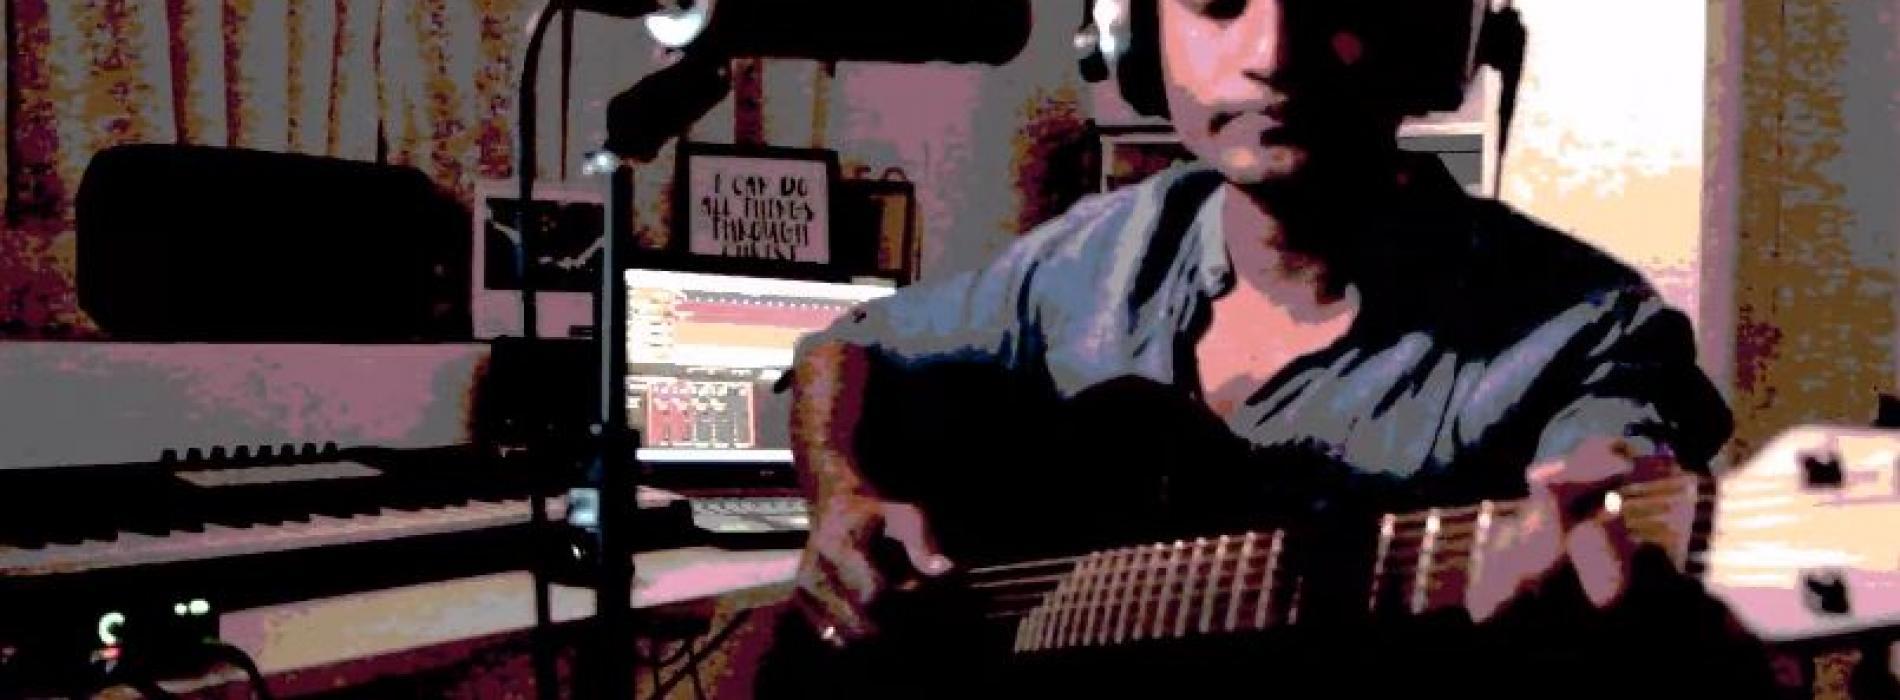 Bohemian Rhapsody (Acoustic Cover by Rav David)